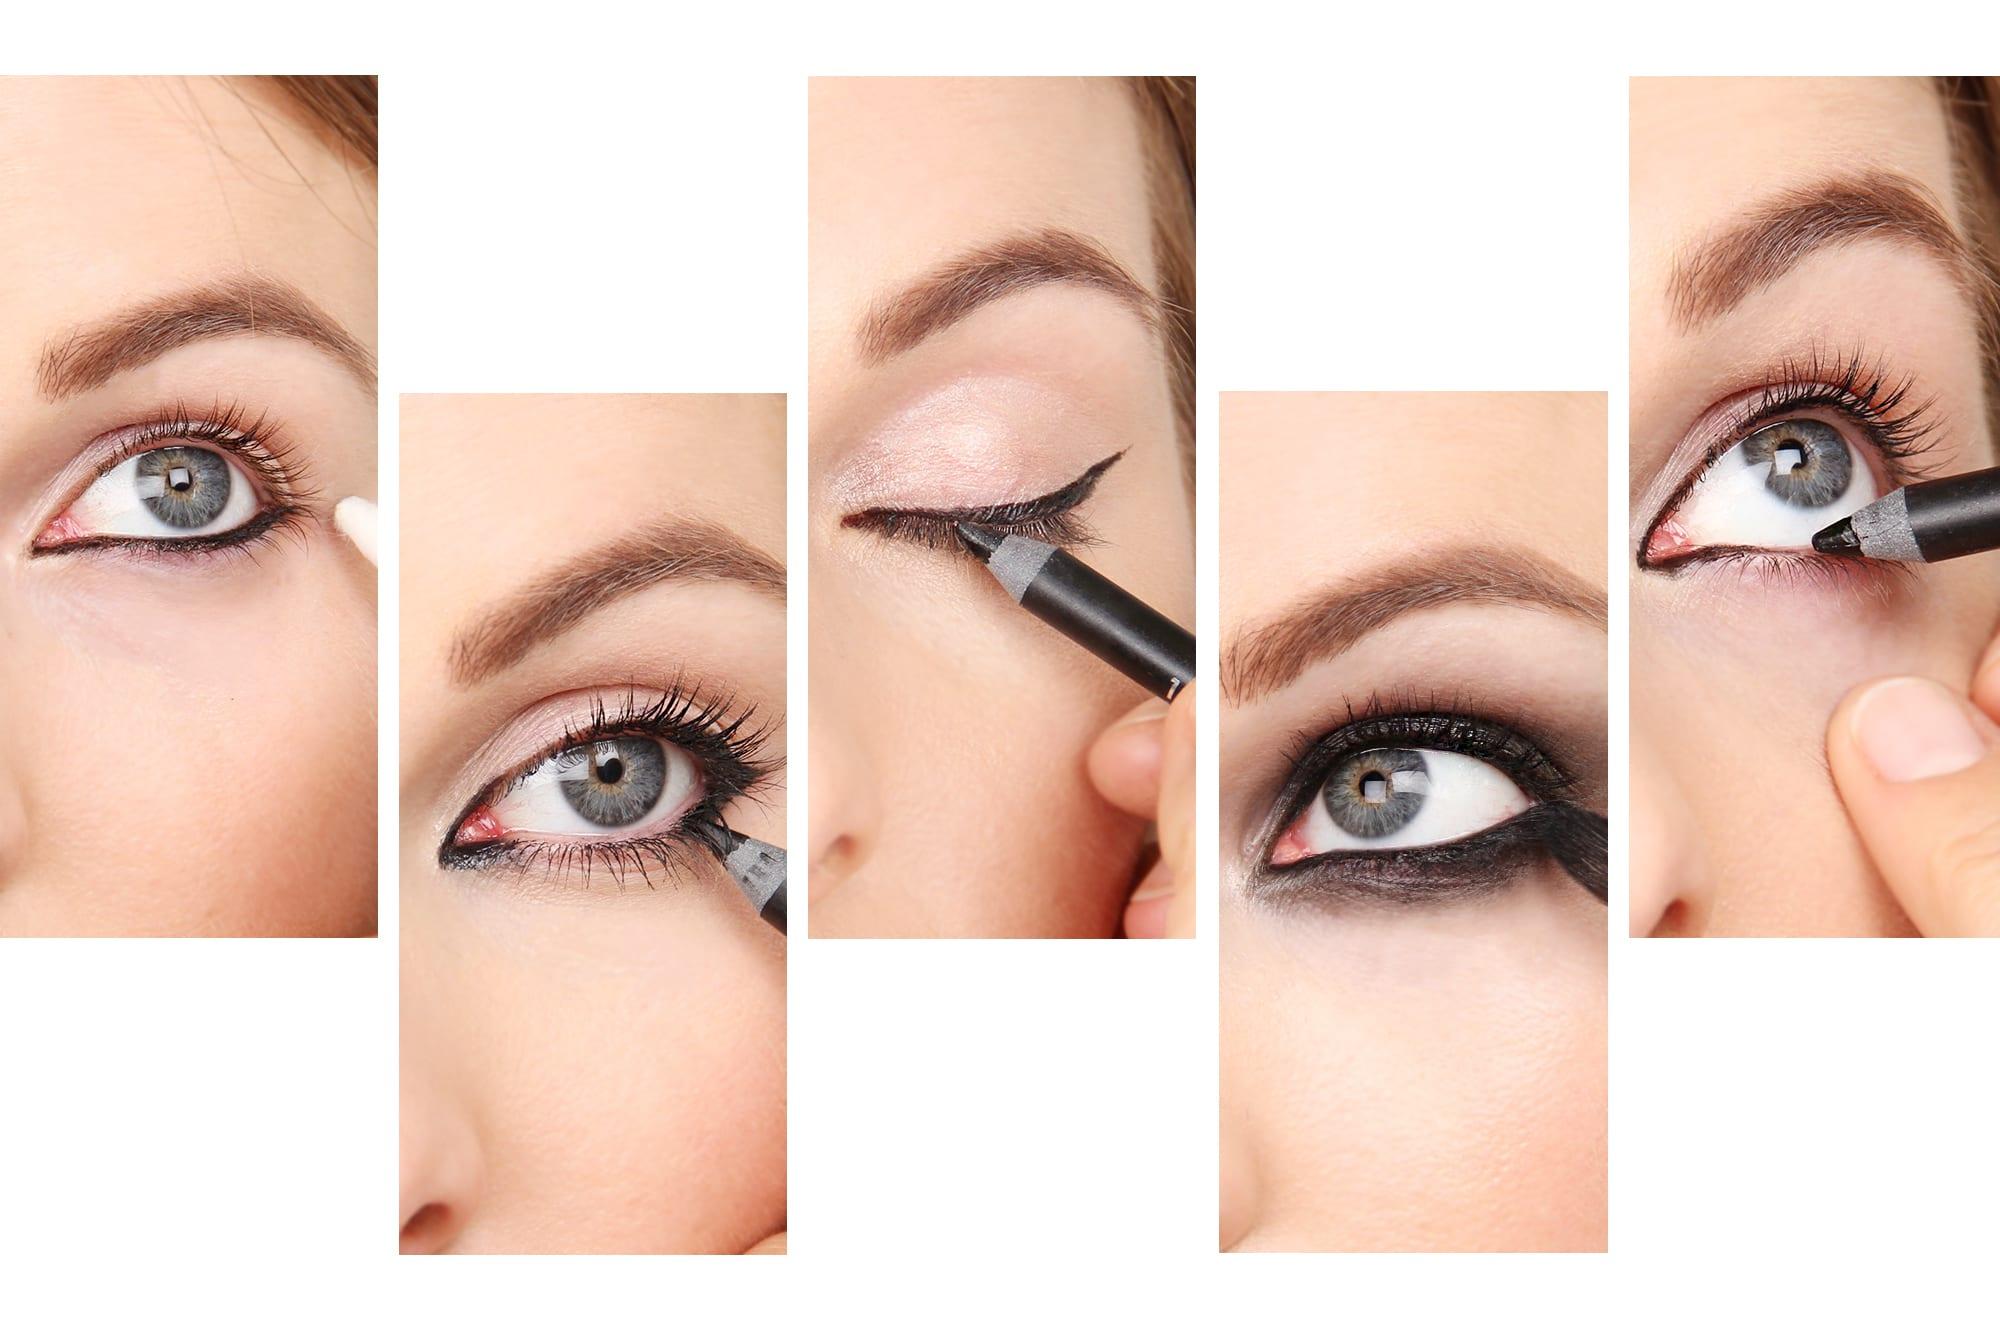 Beauty School: Five Ways To Apply Eyeliner